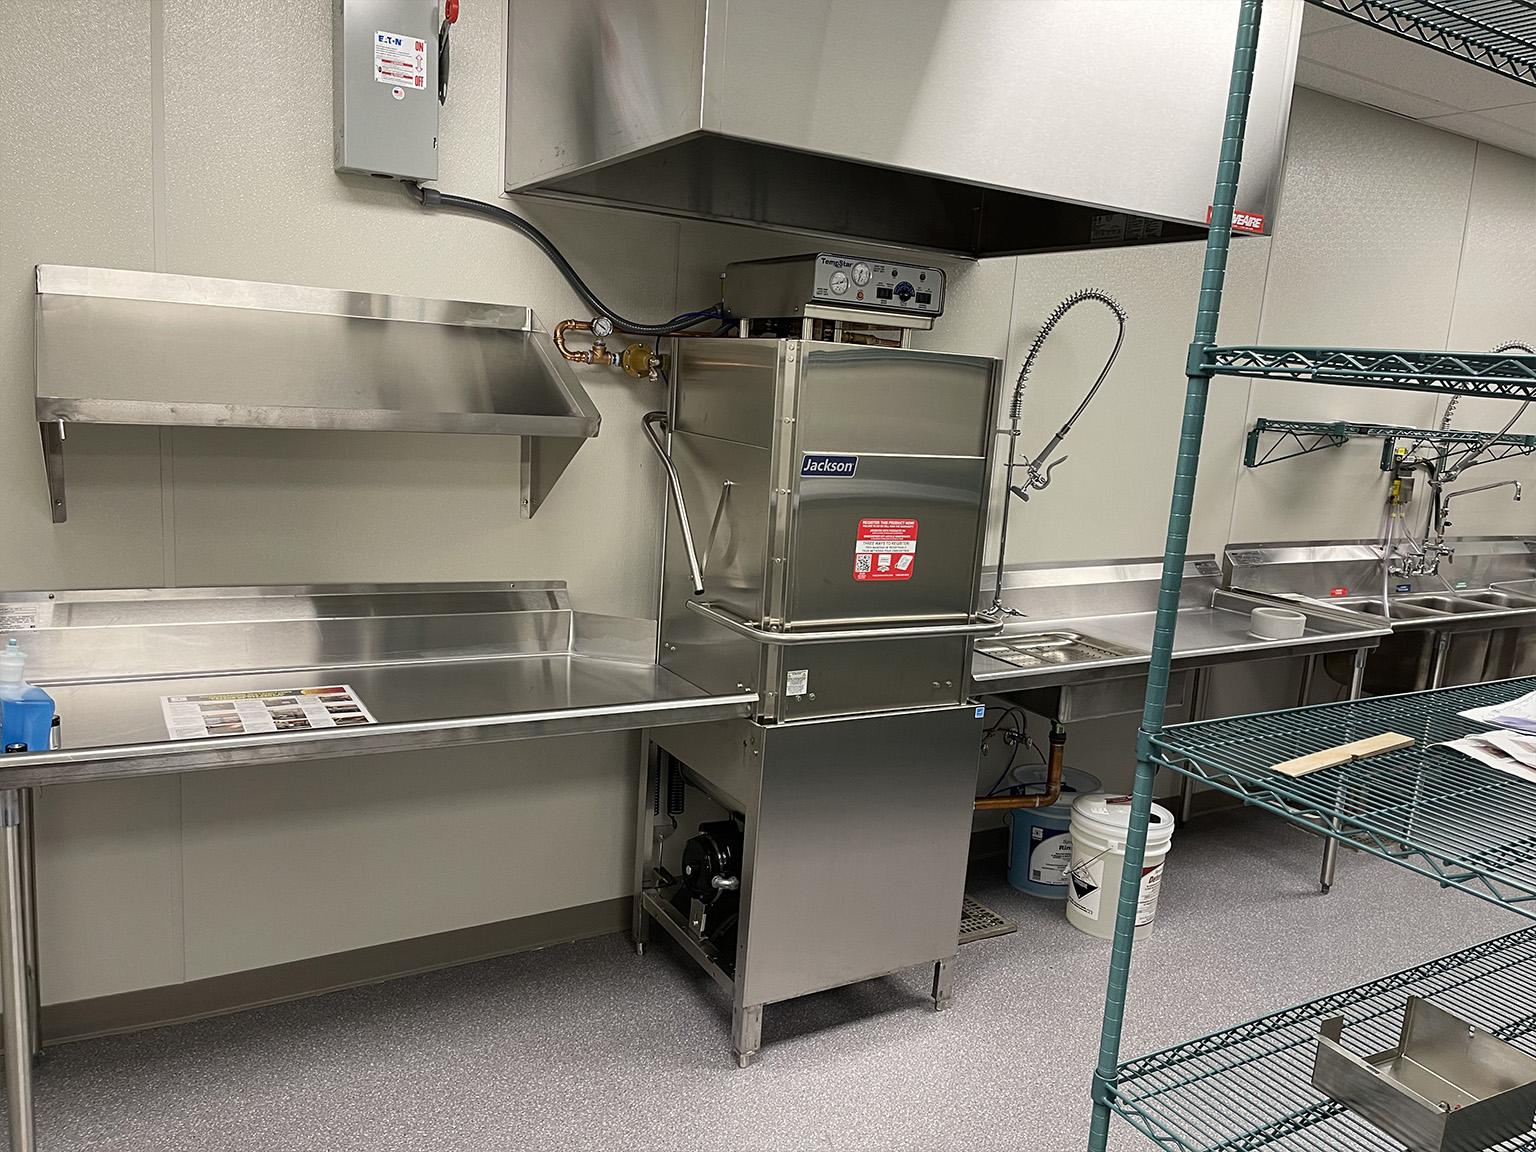 Warewashing station in commercial kitchen